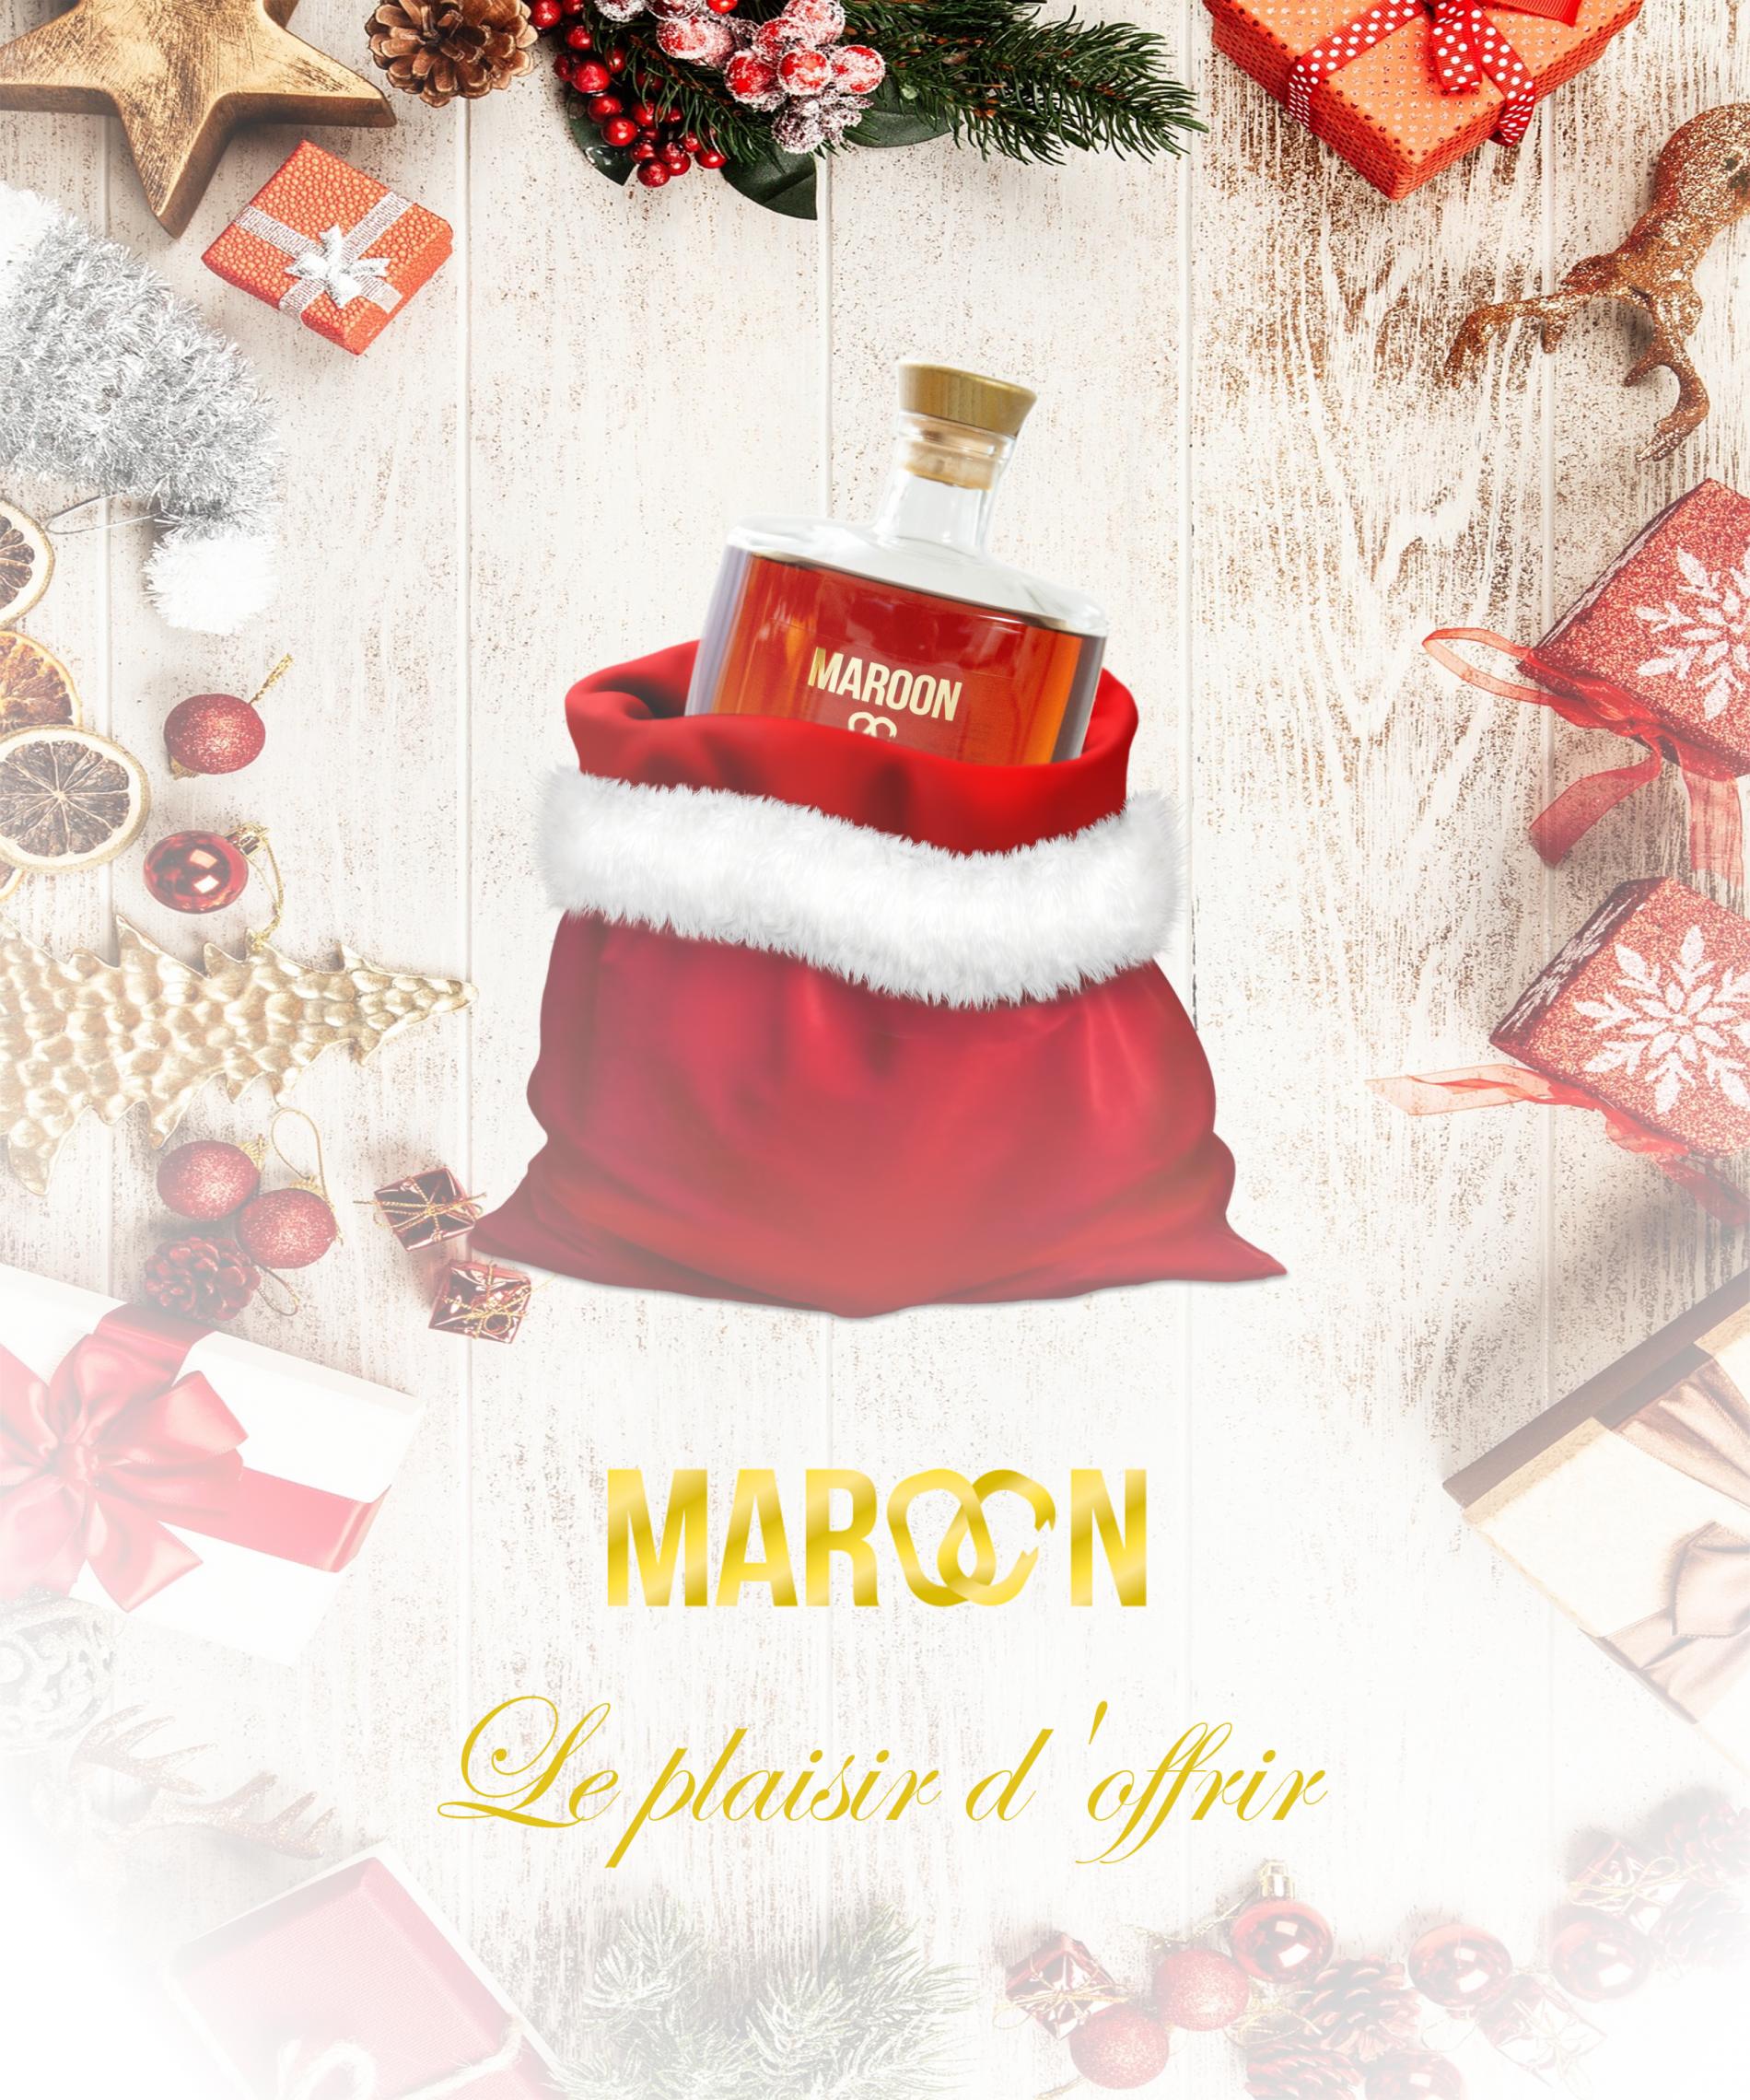 Maroon Noël Fête Spiritueux caribbean rhum